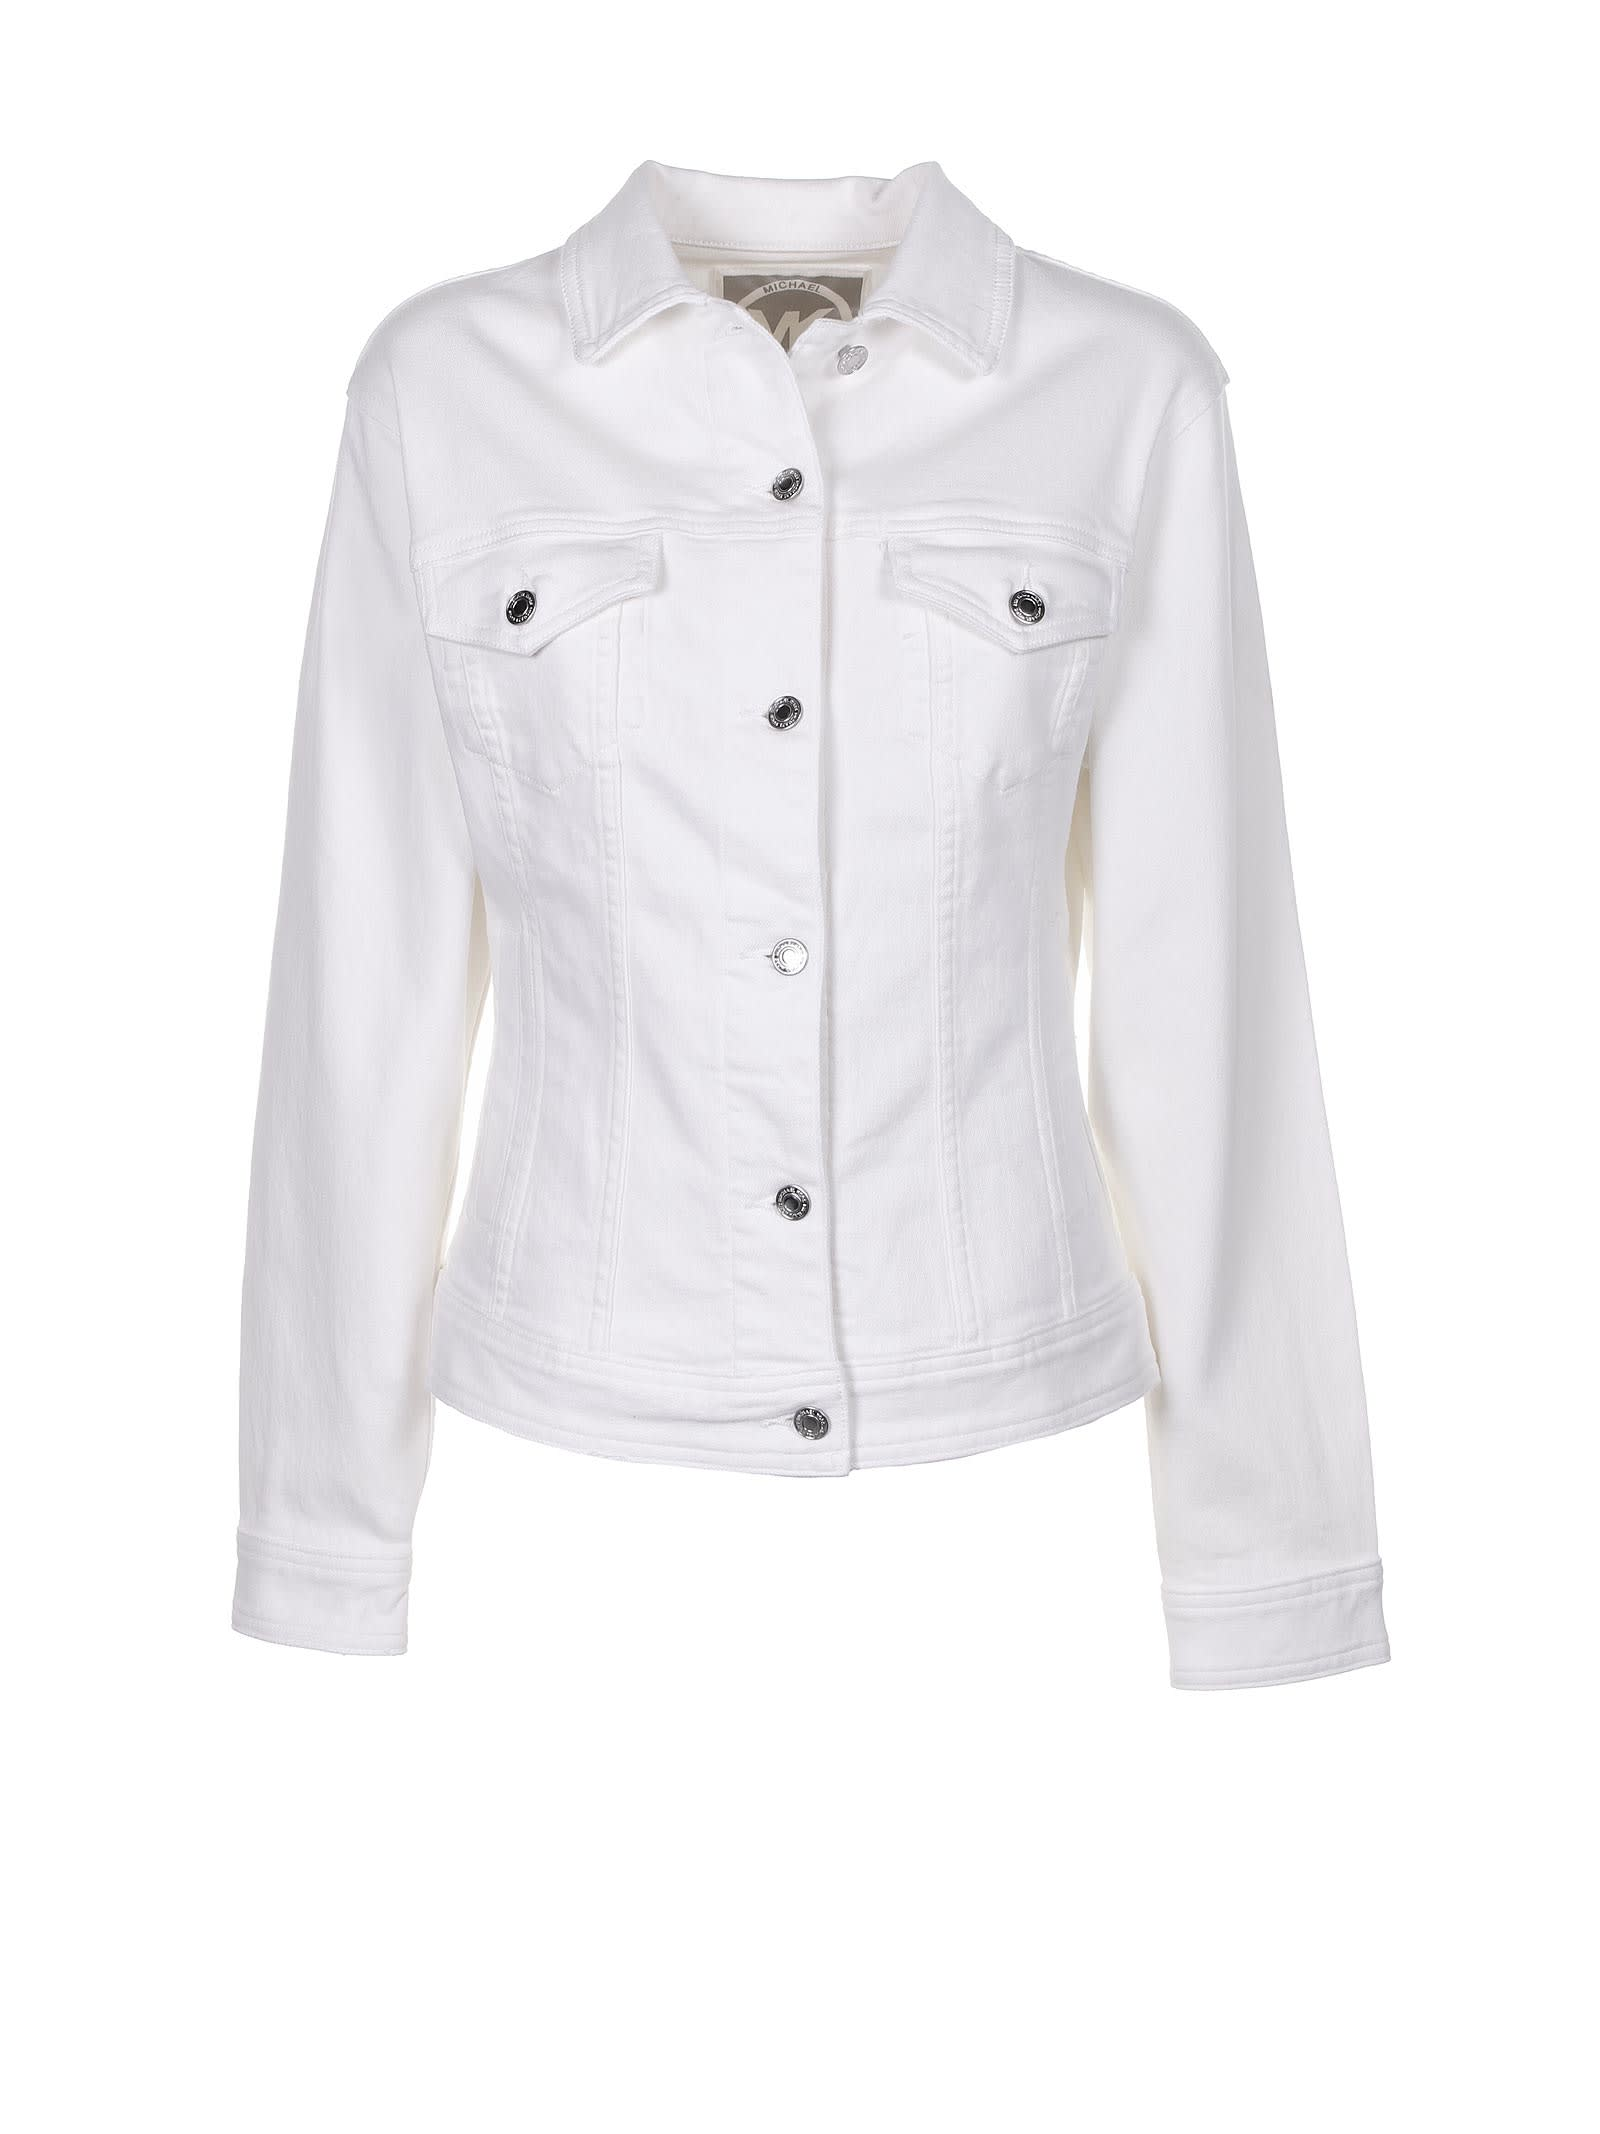 Michael Kors Michael Kors Denim Jacket